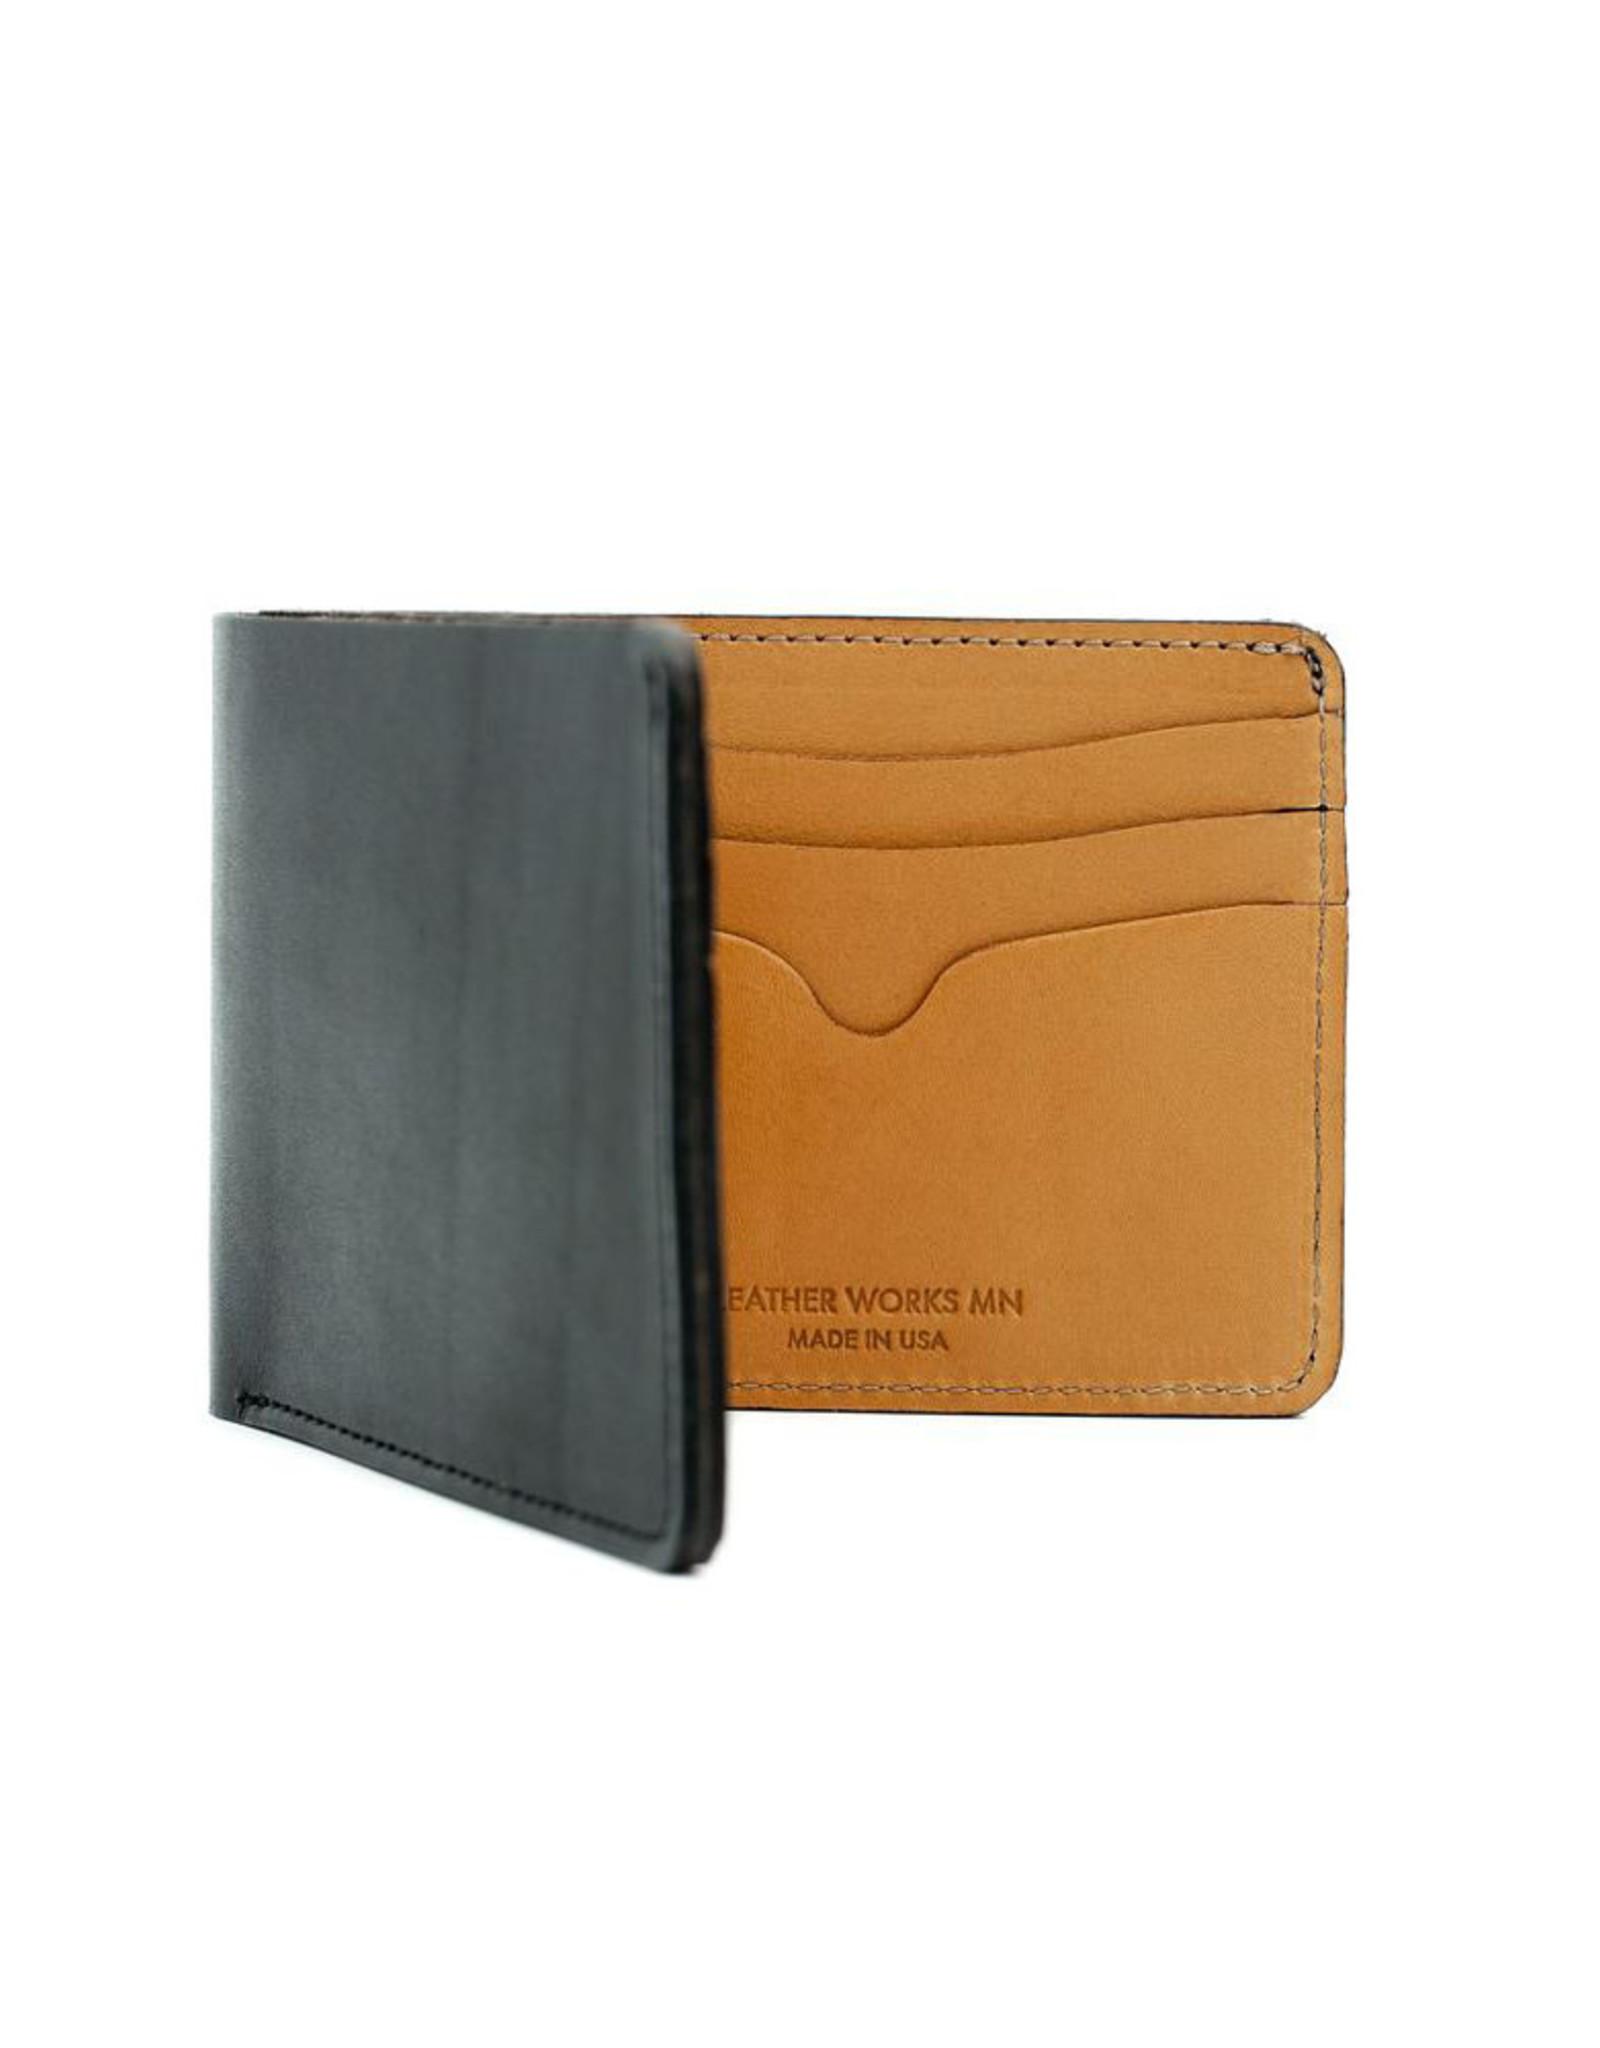 Leather Works Minnesota No. 9 Bifold Wallet